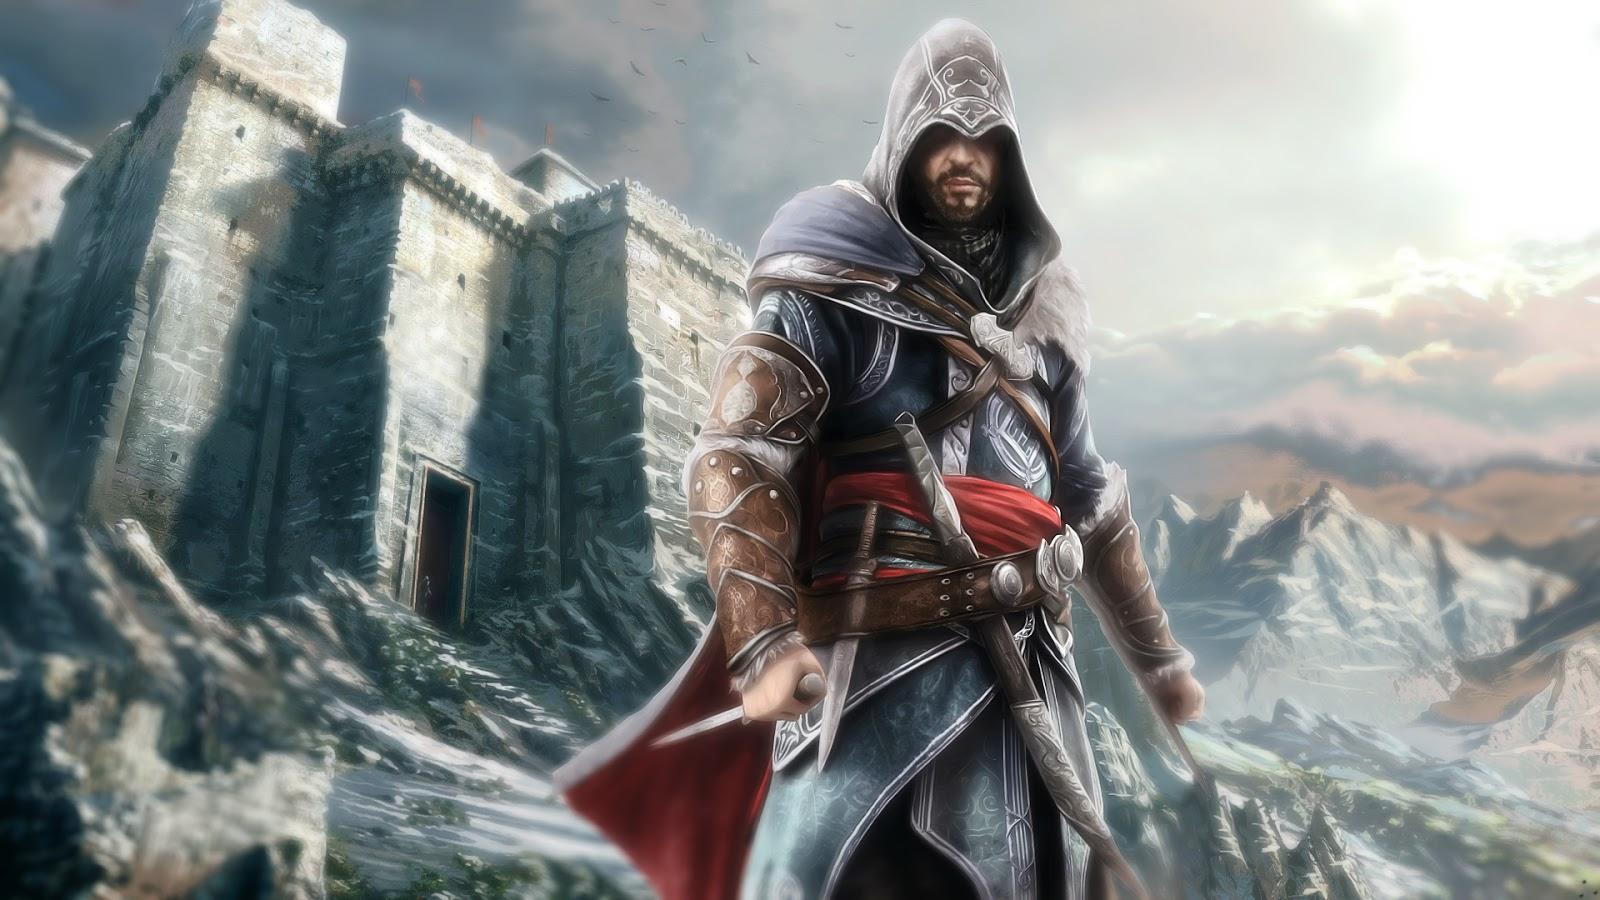 dreamWALLpics: Assassins creed hd wallpapers